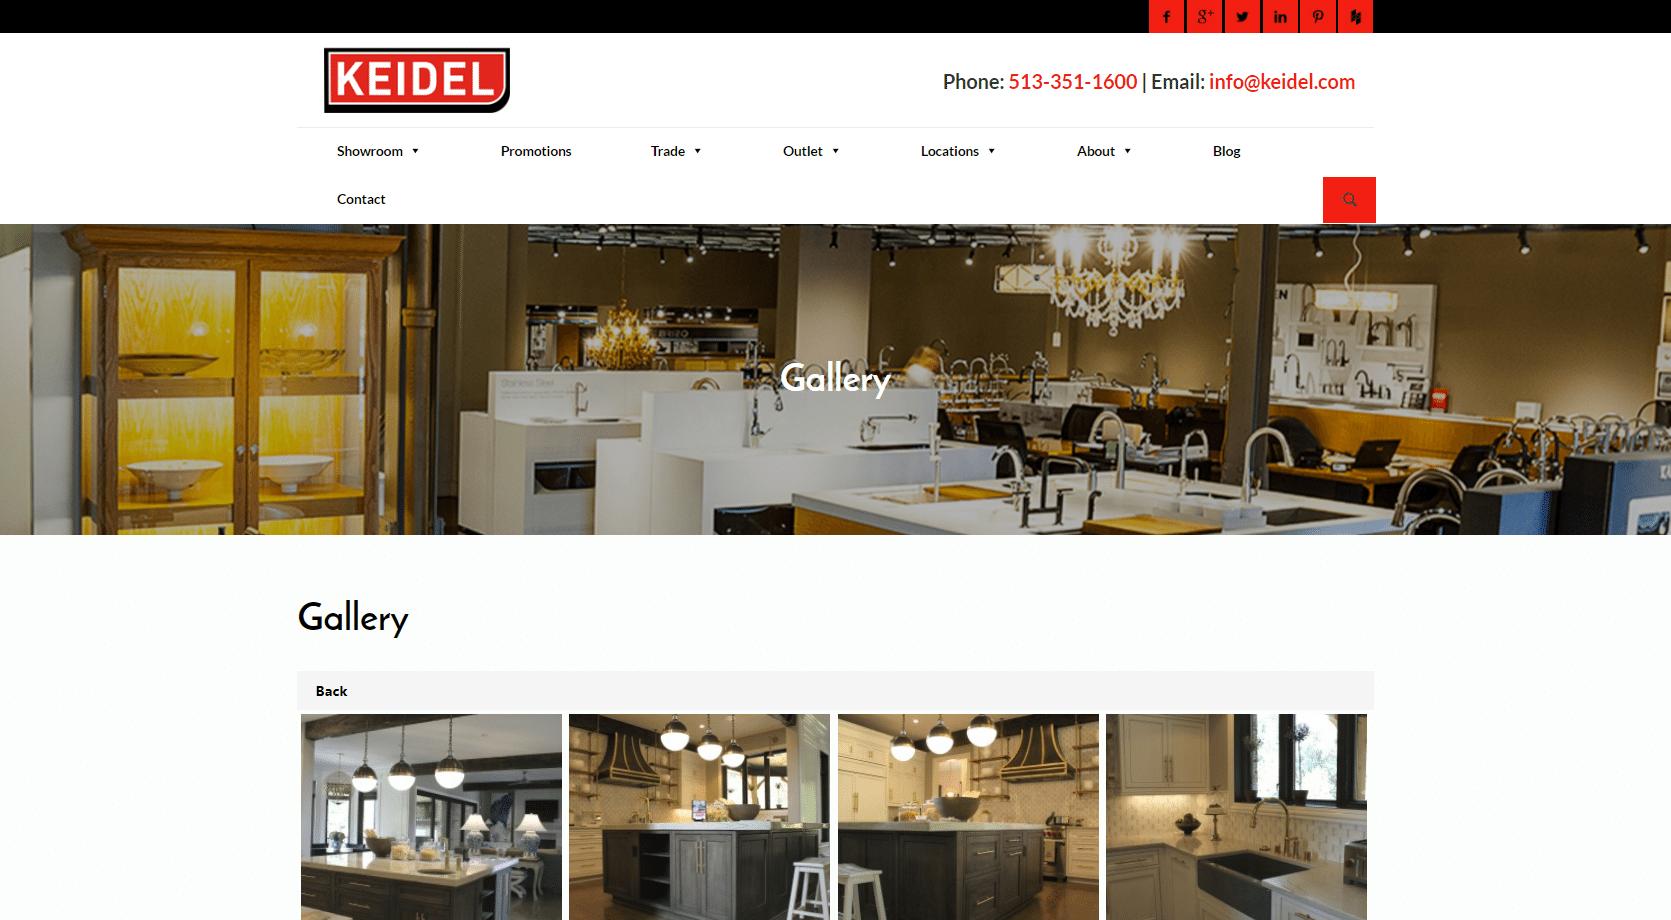 Keidel new website screencap